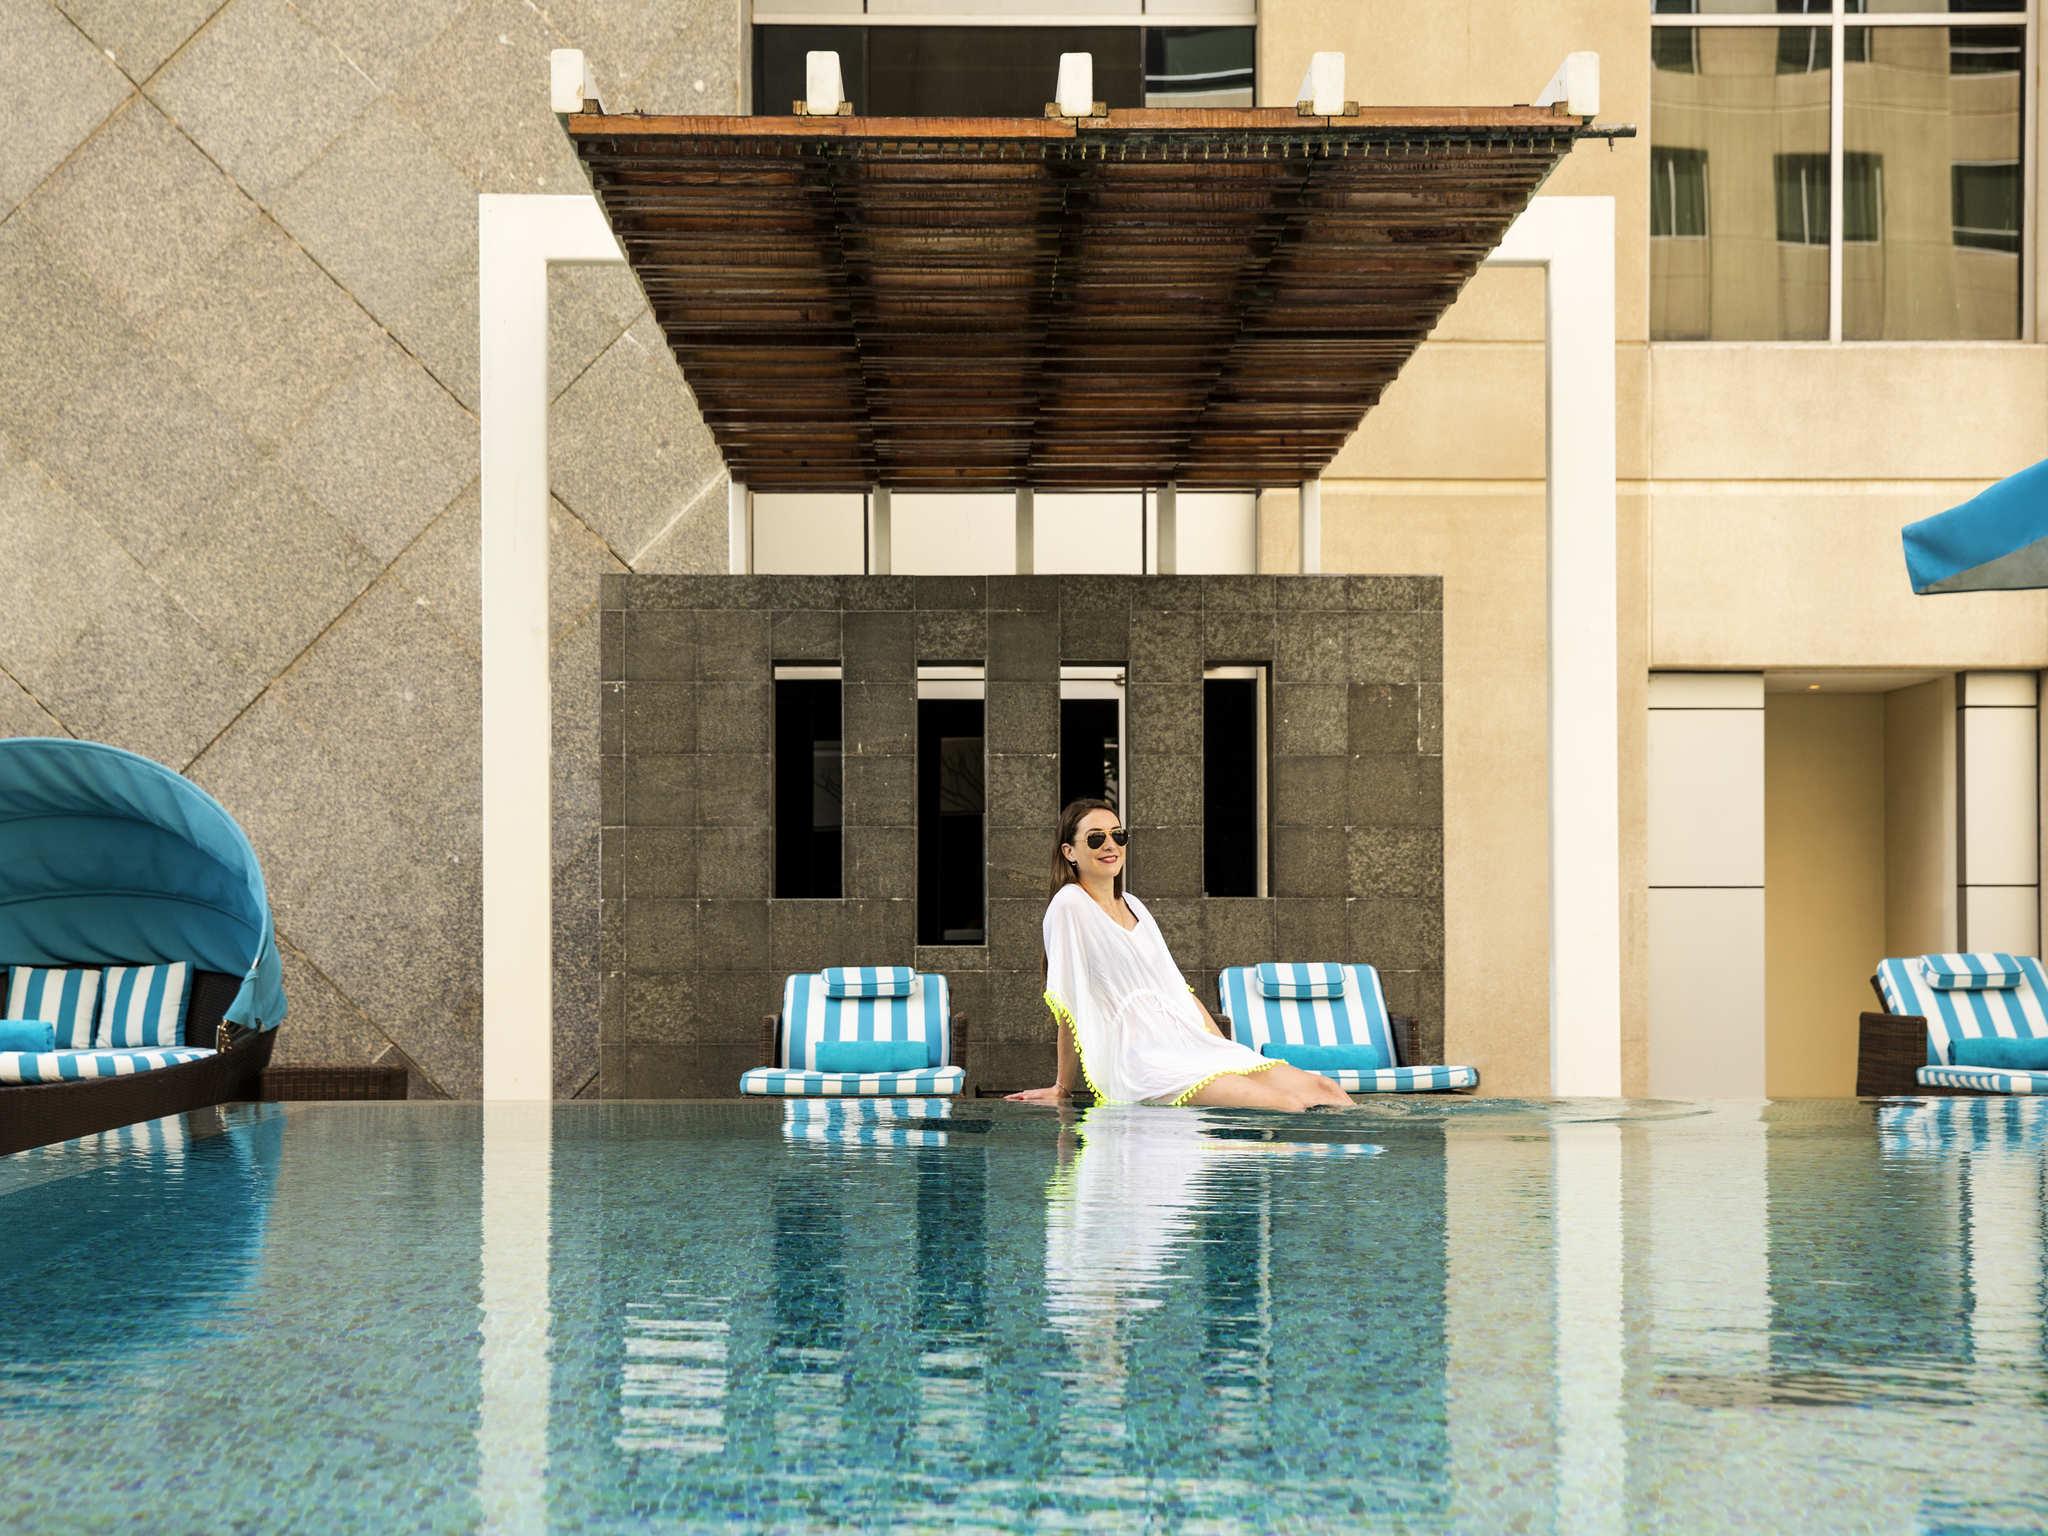 فندق - نوفوتيل Novotel دبي ديرة سيتي سنتر